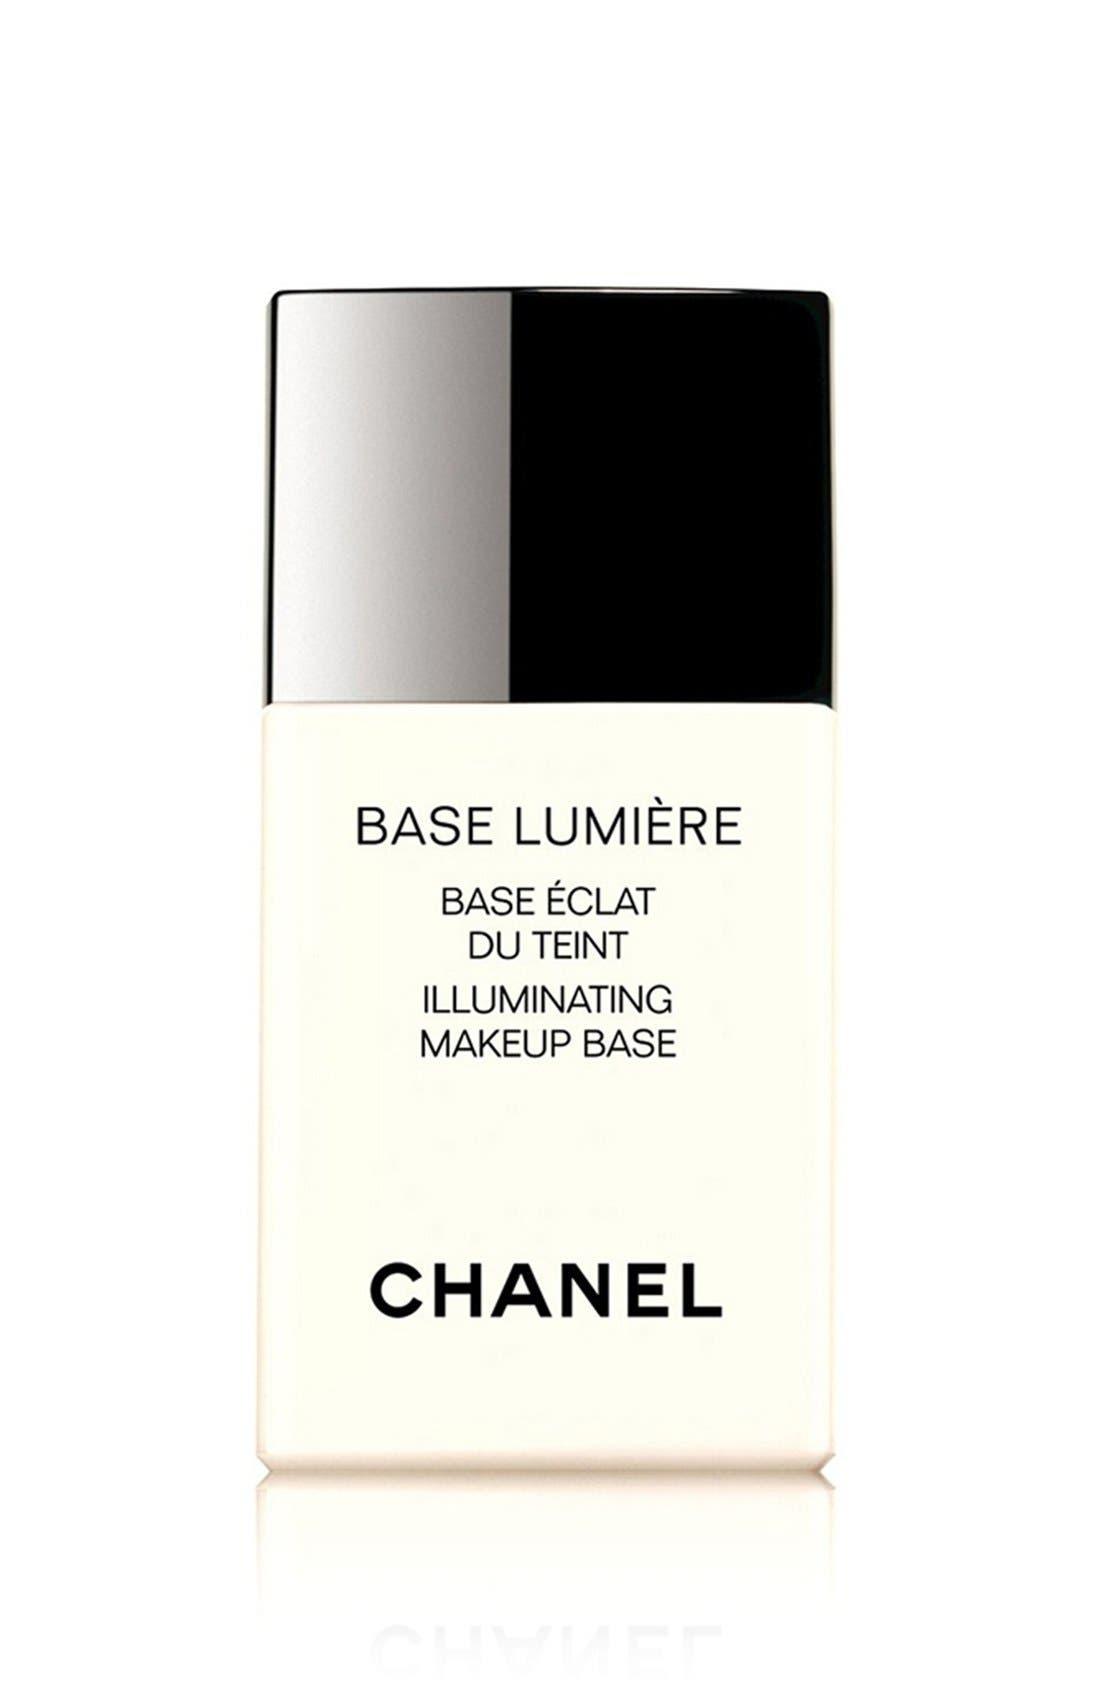 CHANEL BASE LUMIÈRE Illuminating Makeup Base | Nordstrom